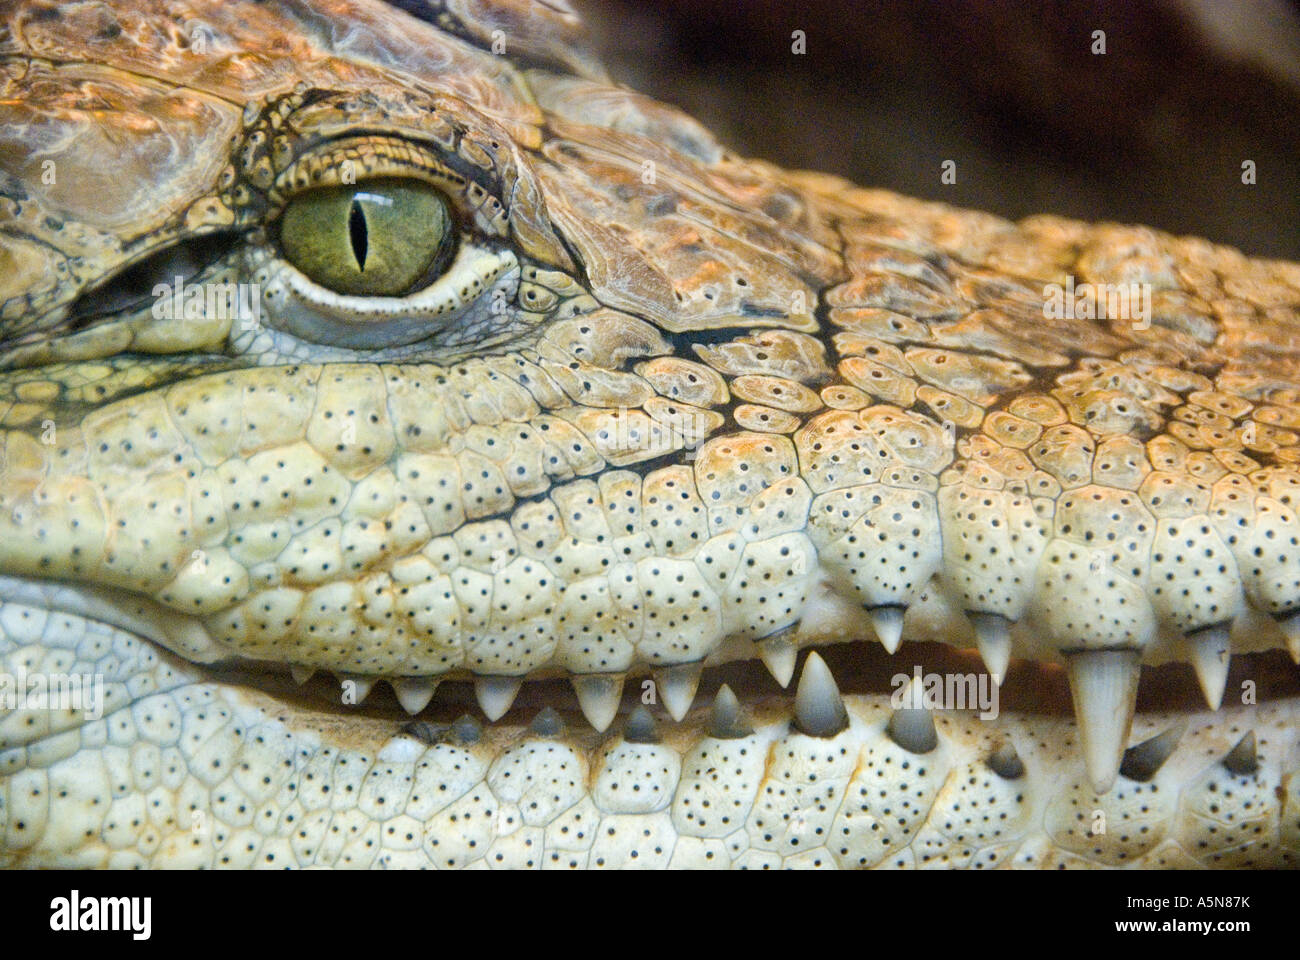 Crocodylus cocodrilo Imagen De Stock